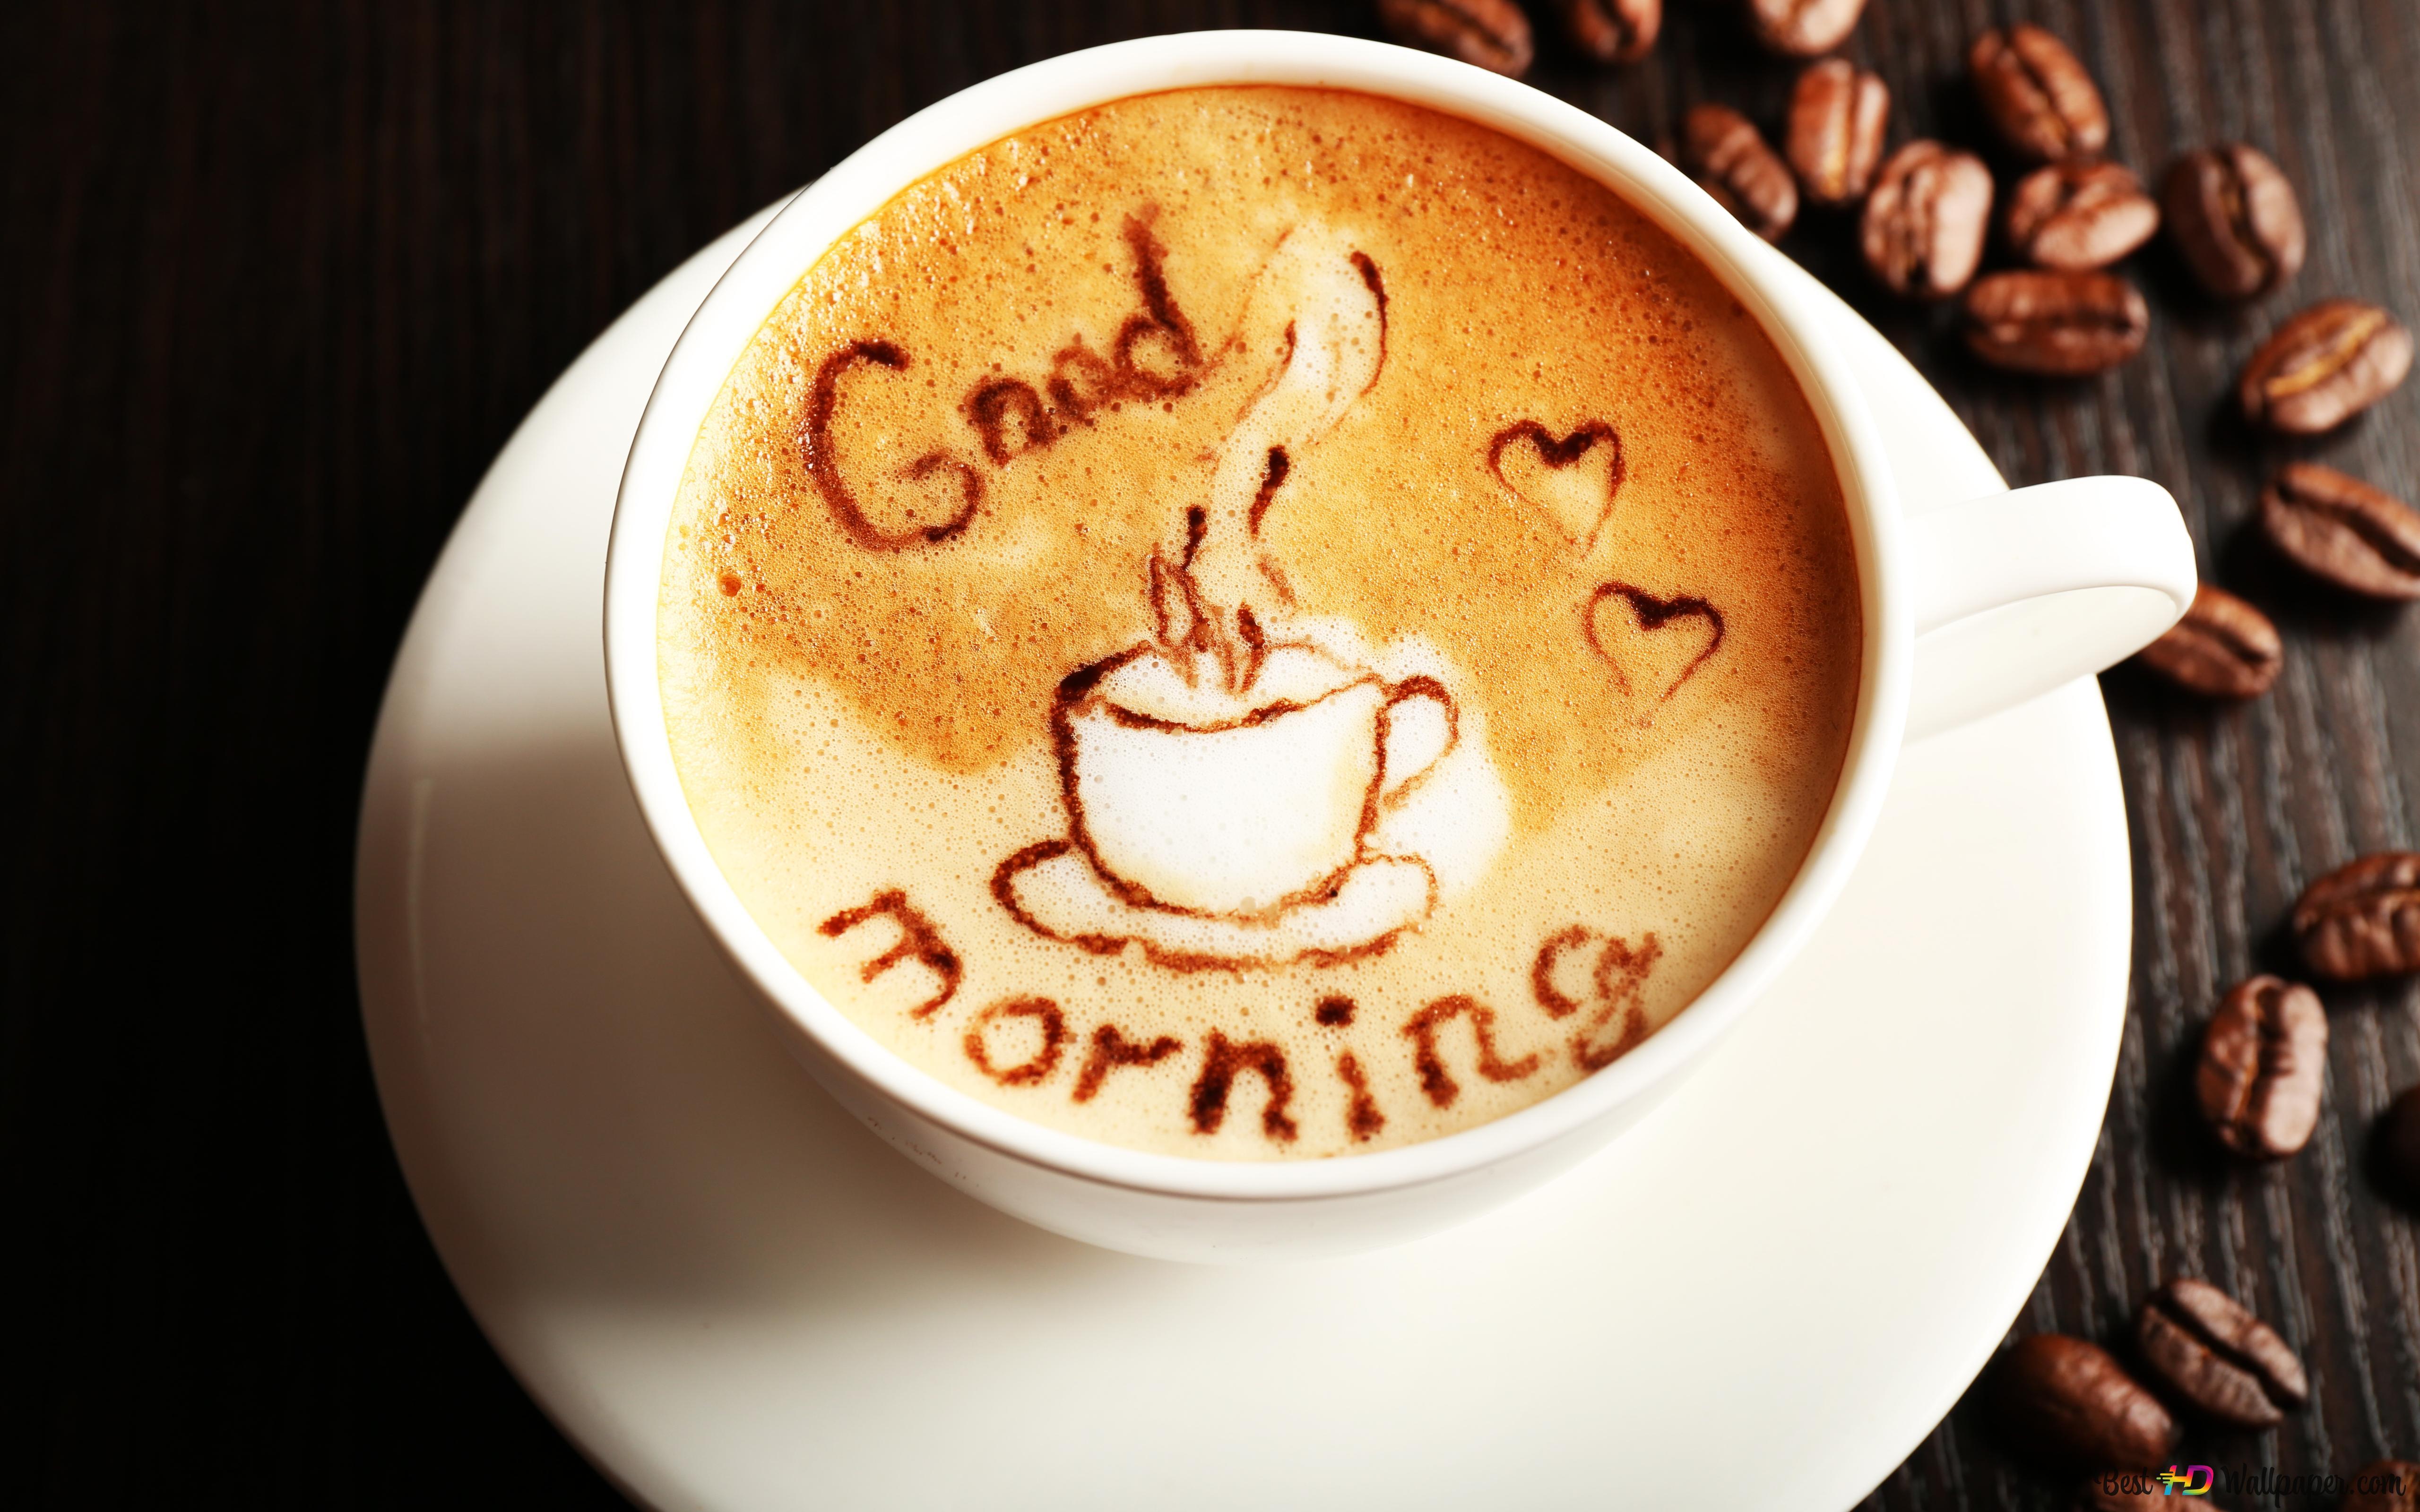 Good Morning Coffee Hd Wallpaper Download